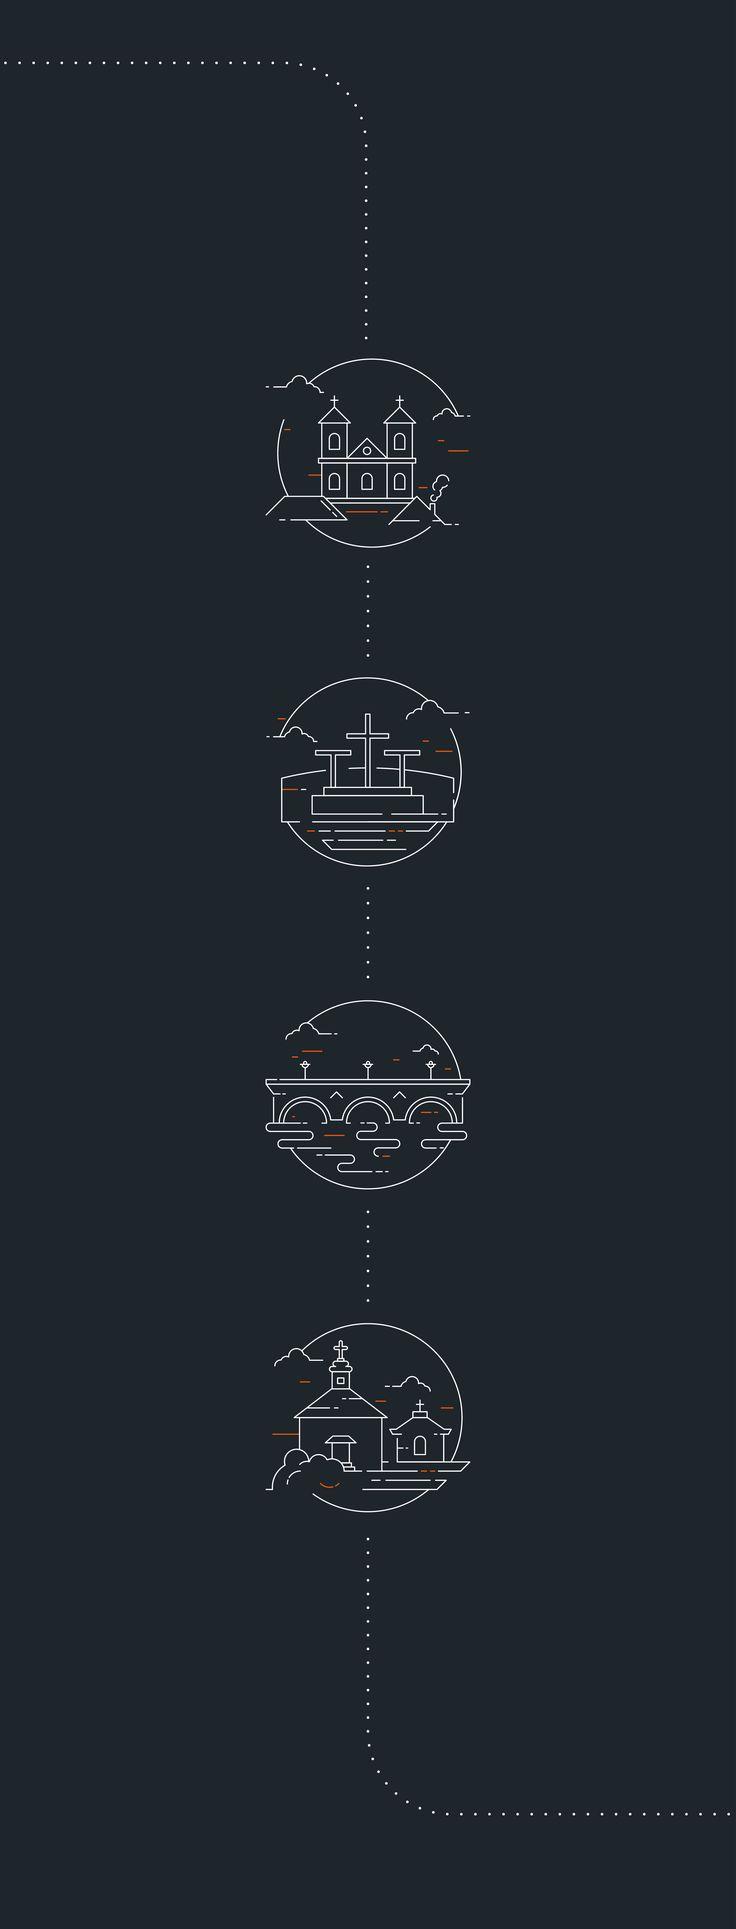 Set of icons made for Bardo. Single Track